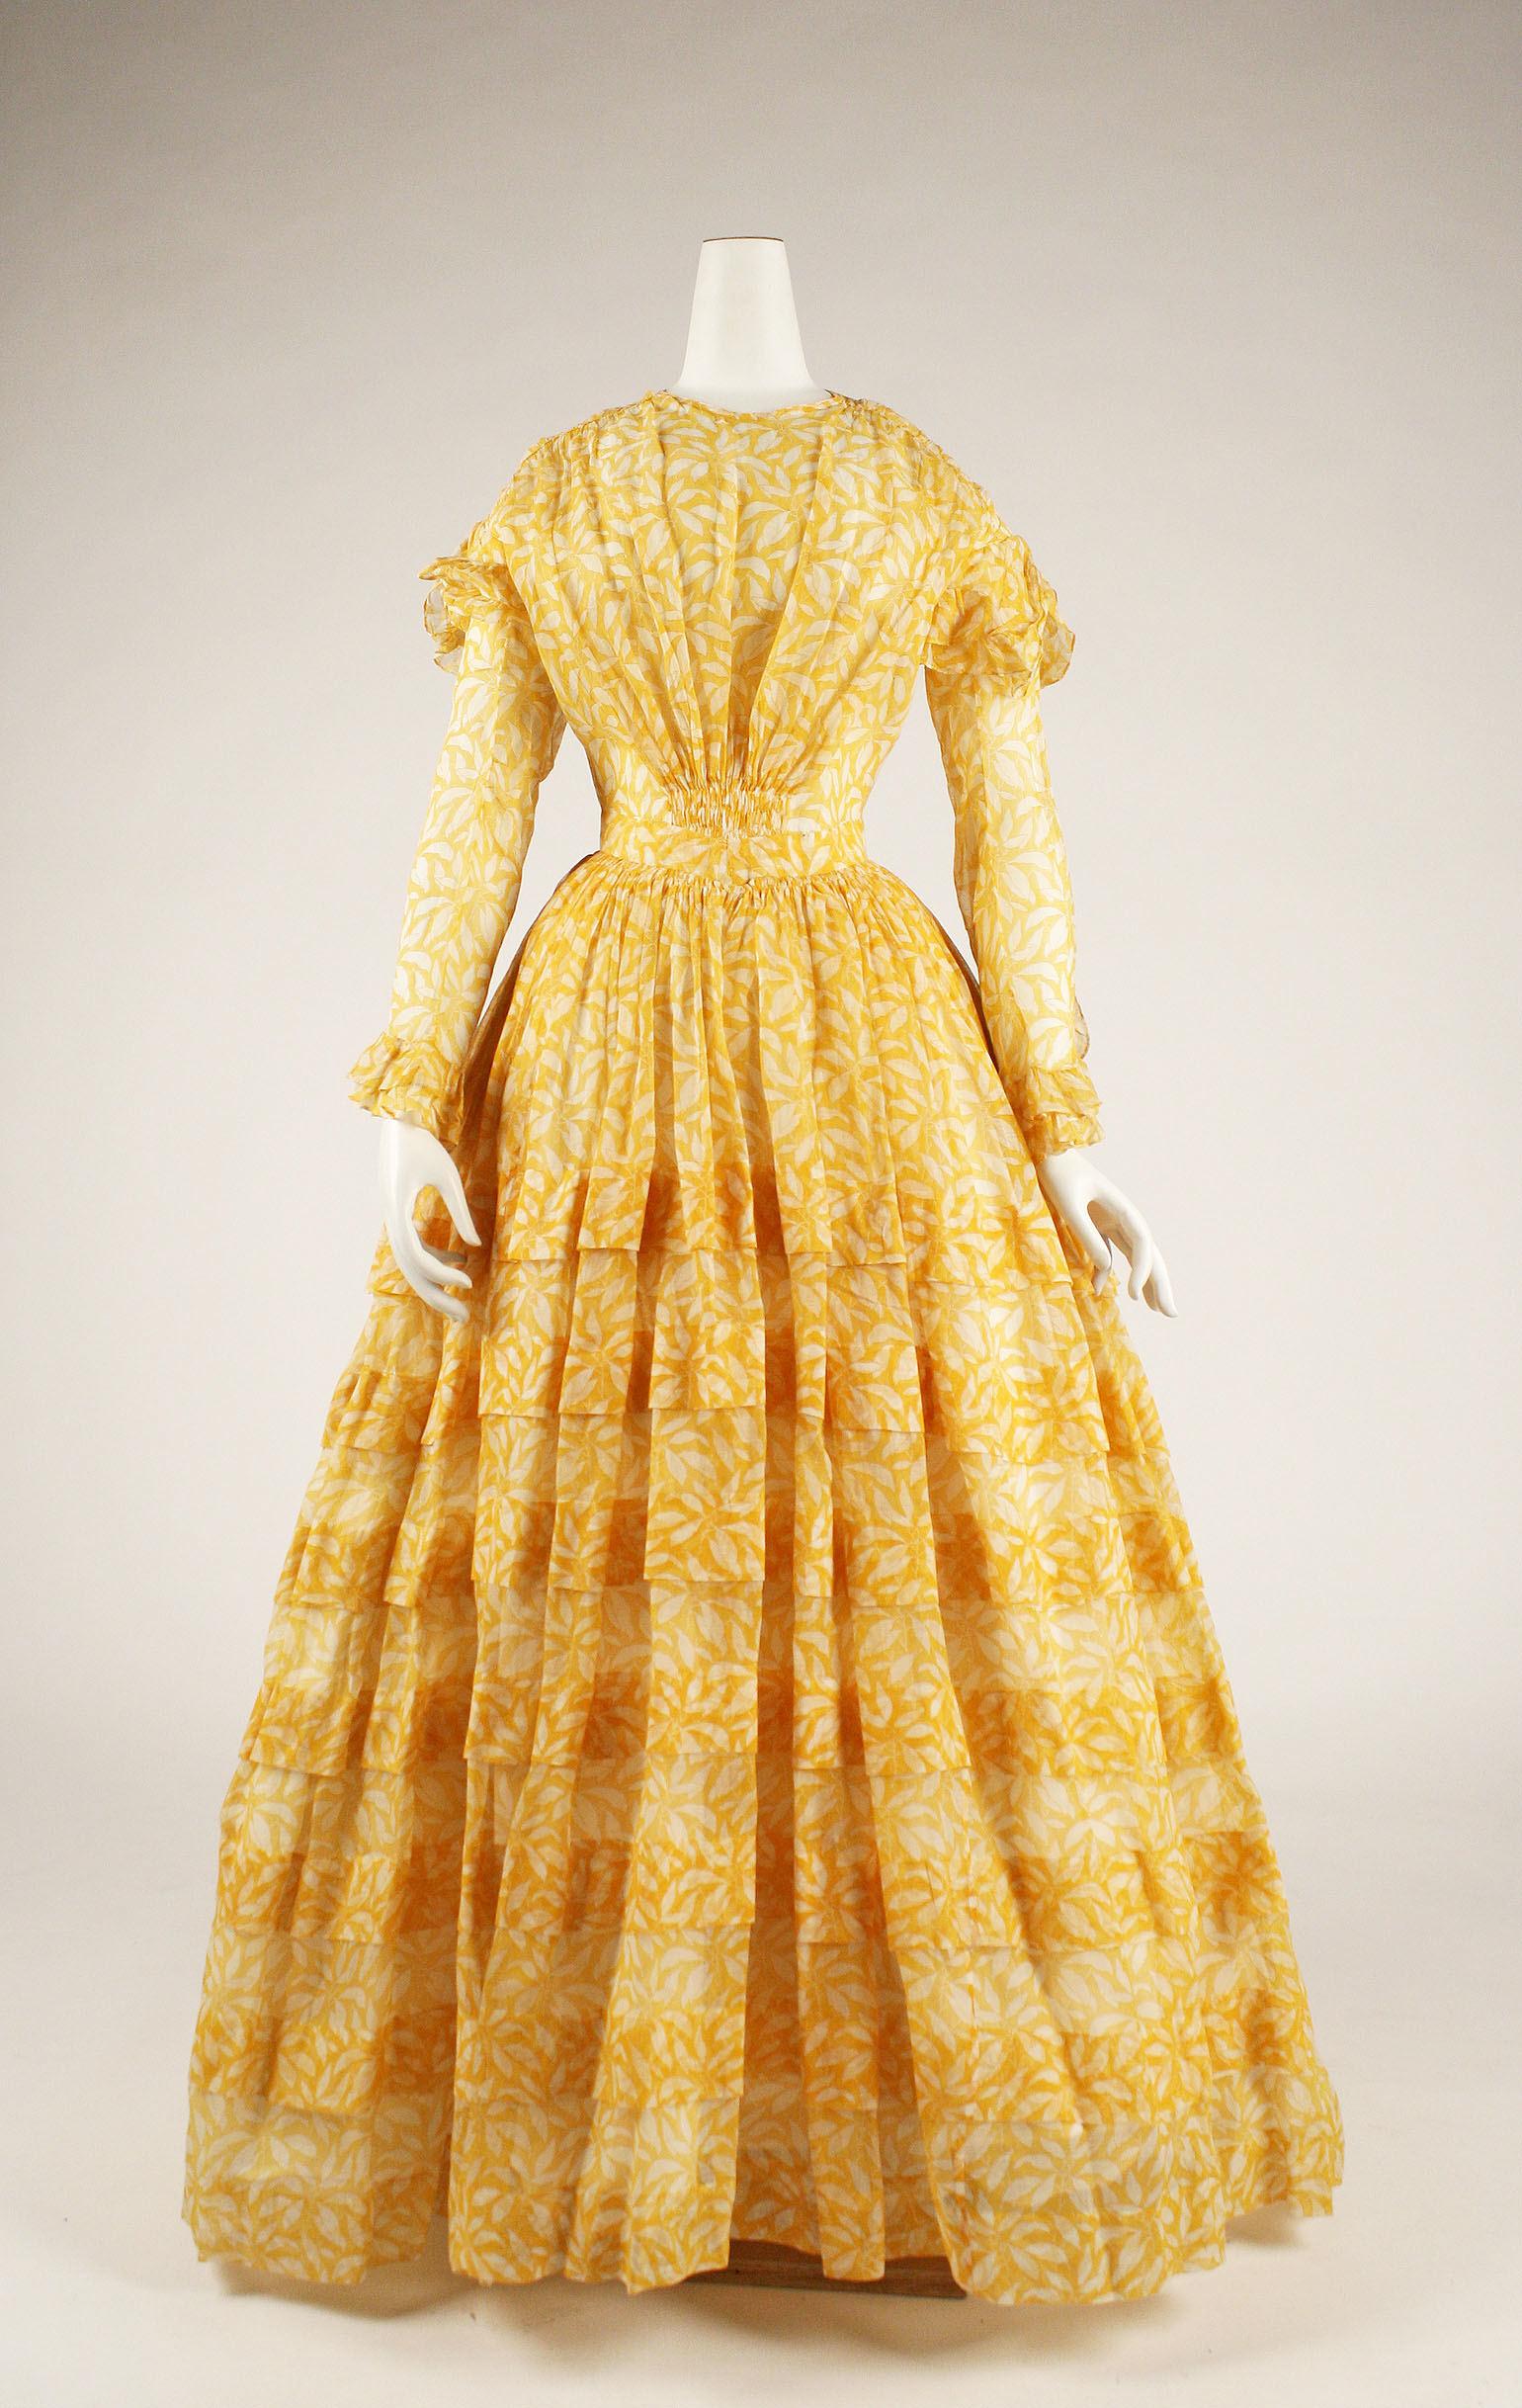 1844 yellow american cotton dress 1 via met museum